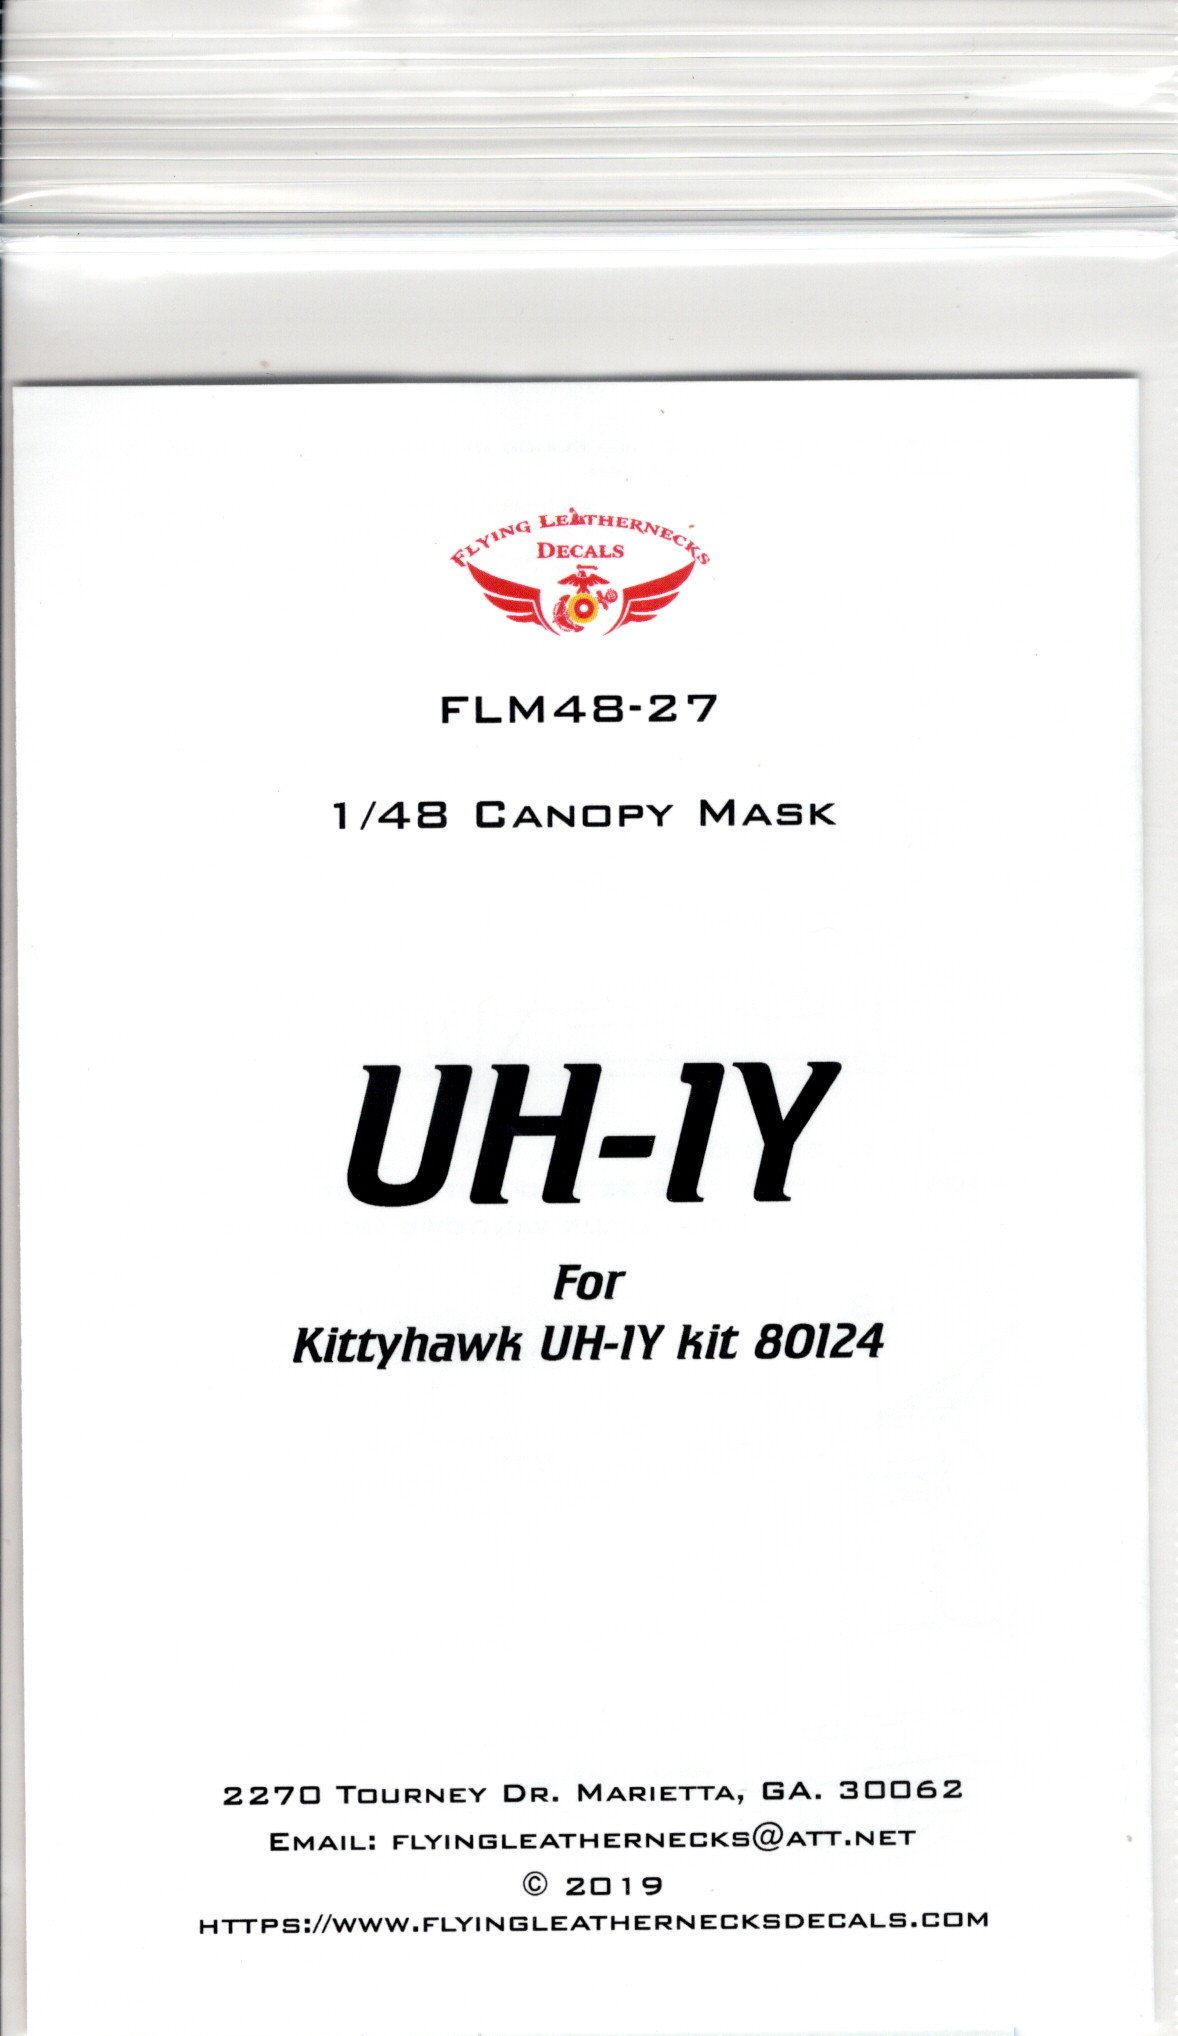 FLM48-27